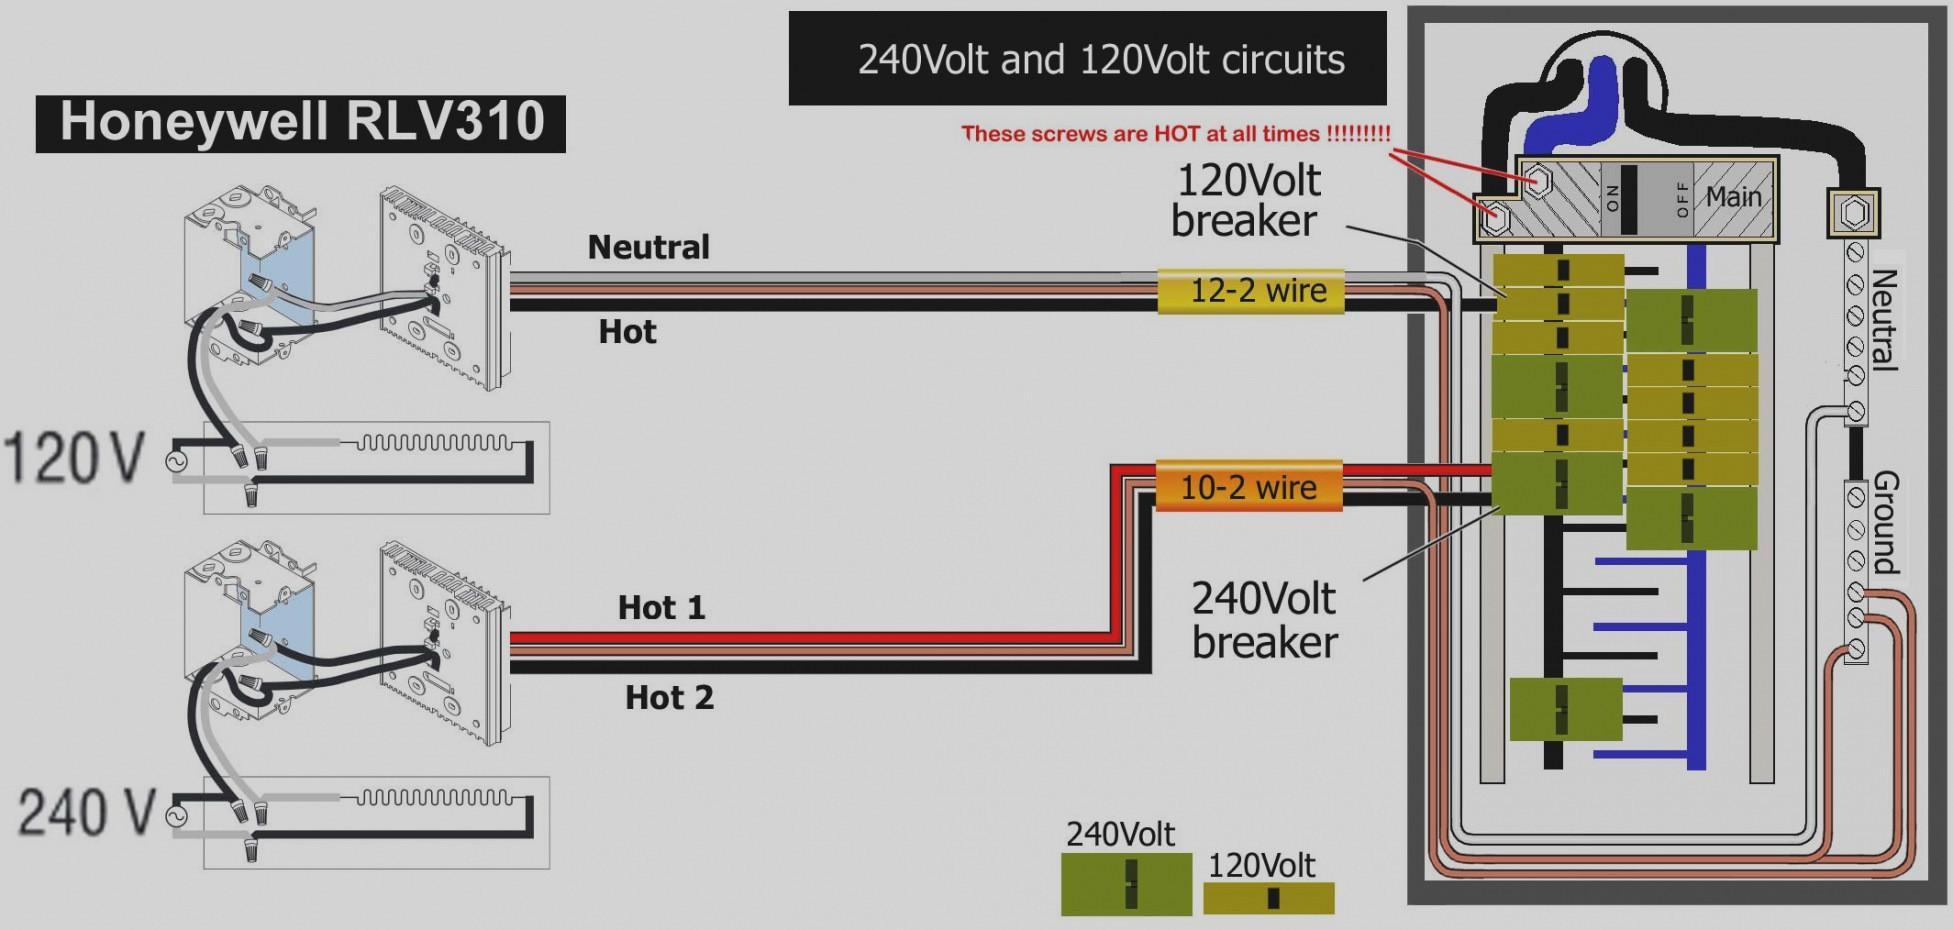 Common Wiring Diagrams Best Of Excellent 220 Volt Pid Diagram Exelent Embellishment